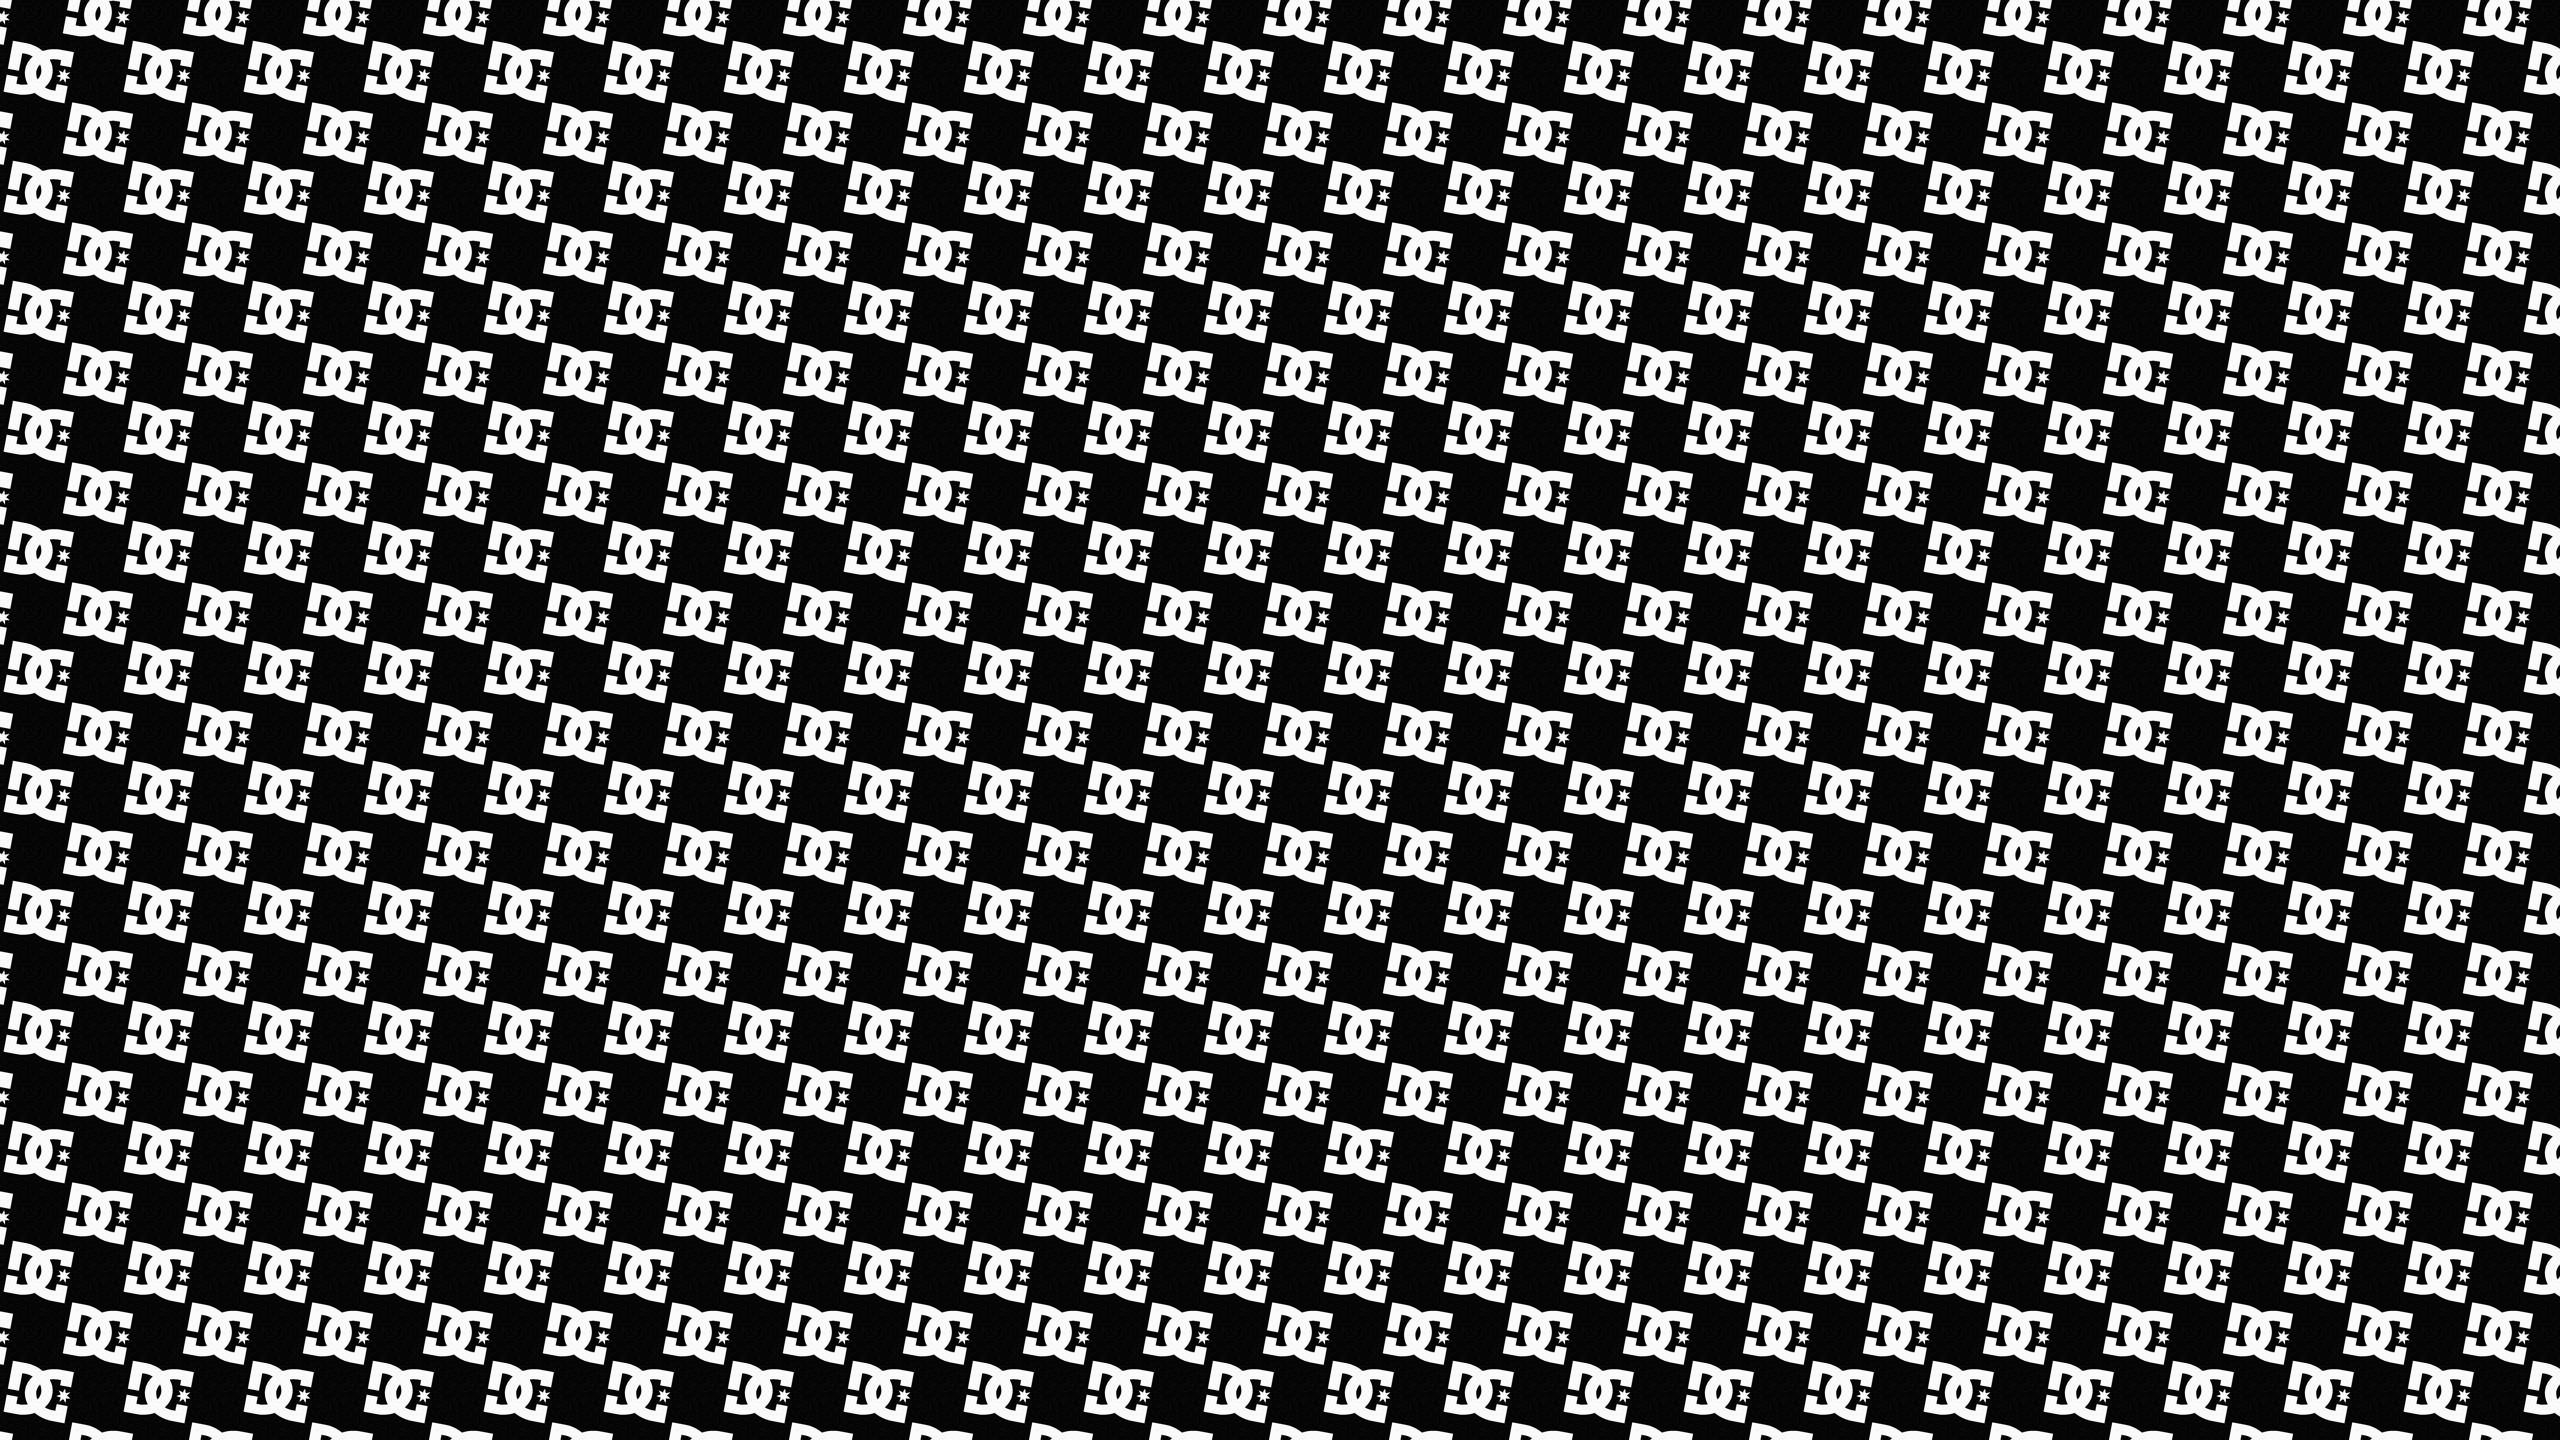 Cool shoes hd wallpapers 76 images 1920x1080 jordan wallpaper cool desktop voltagebd Gallery